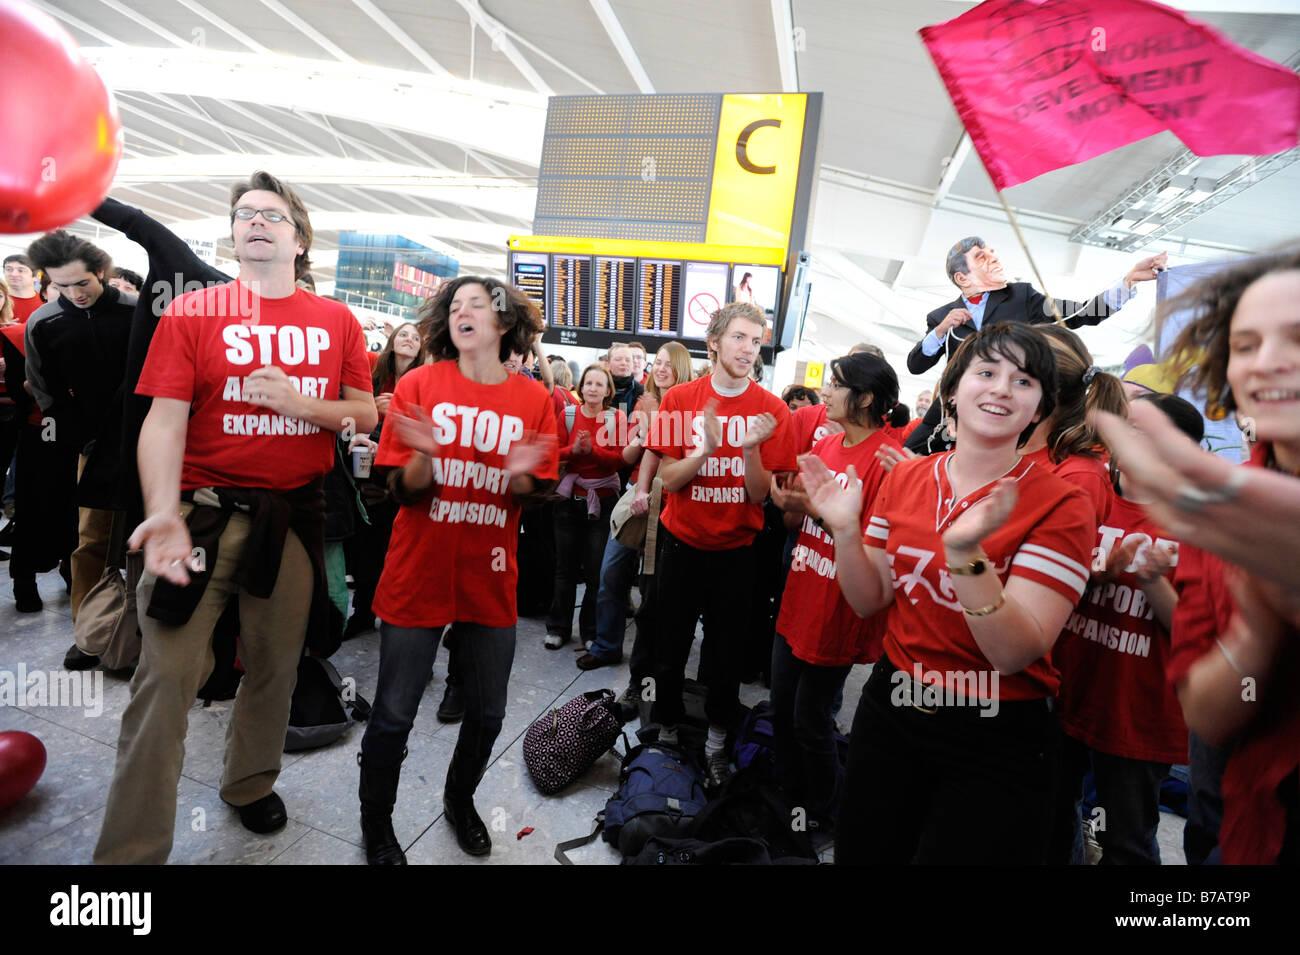 Flashmob No Third Runway protest at Heathrow airport Terminal 5 17 1 08 - Stock Image